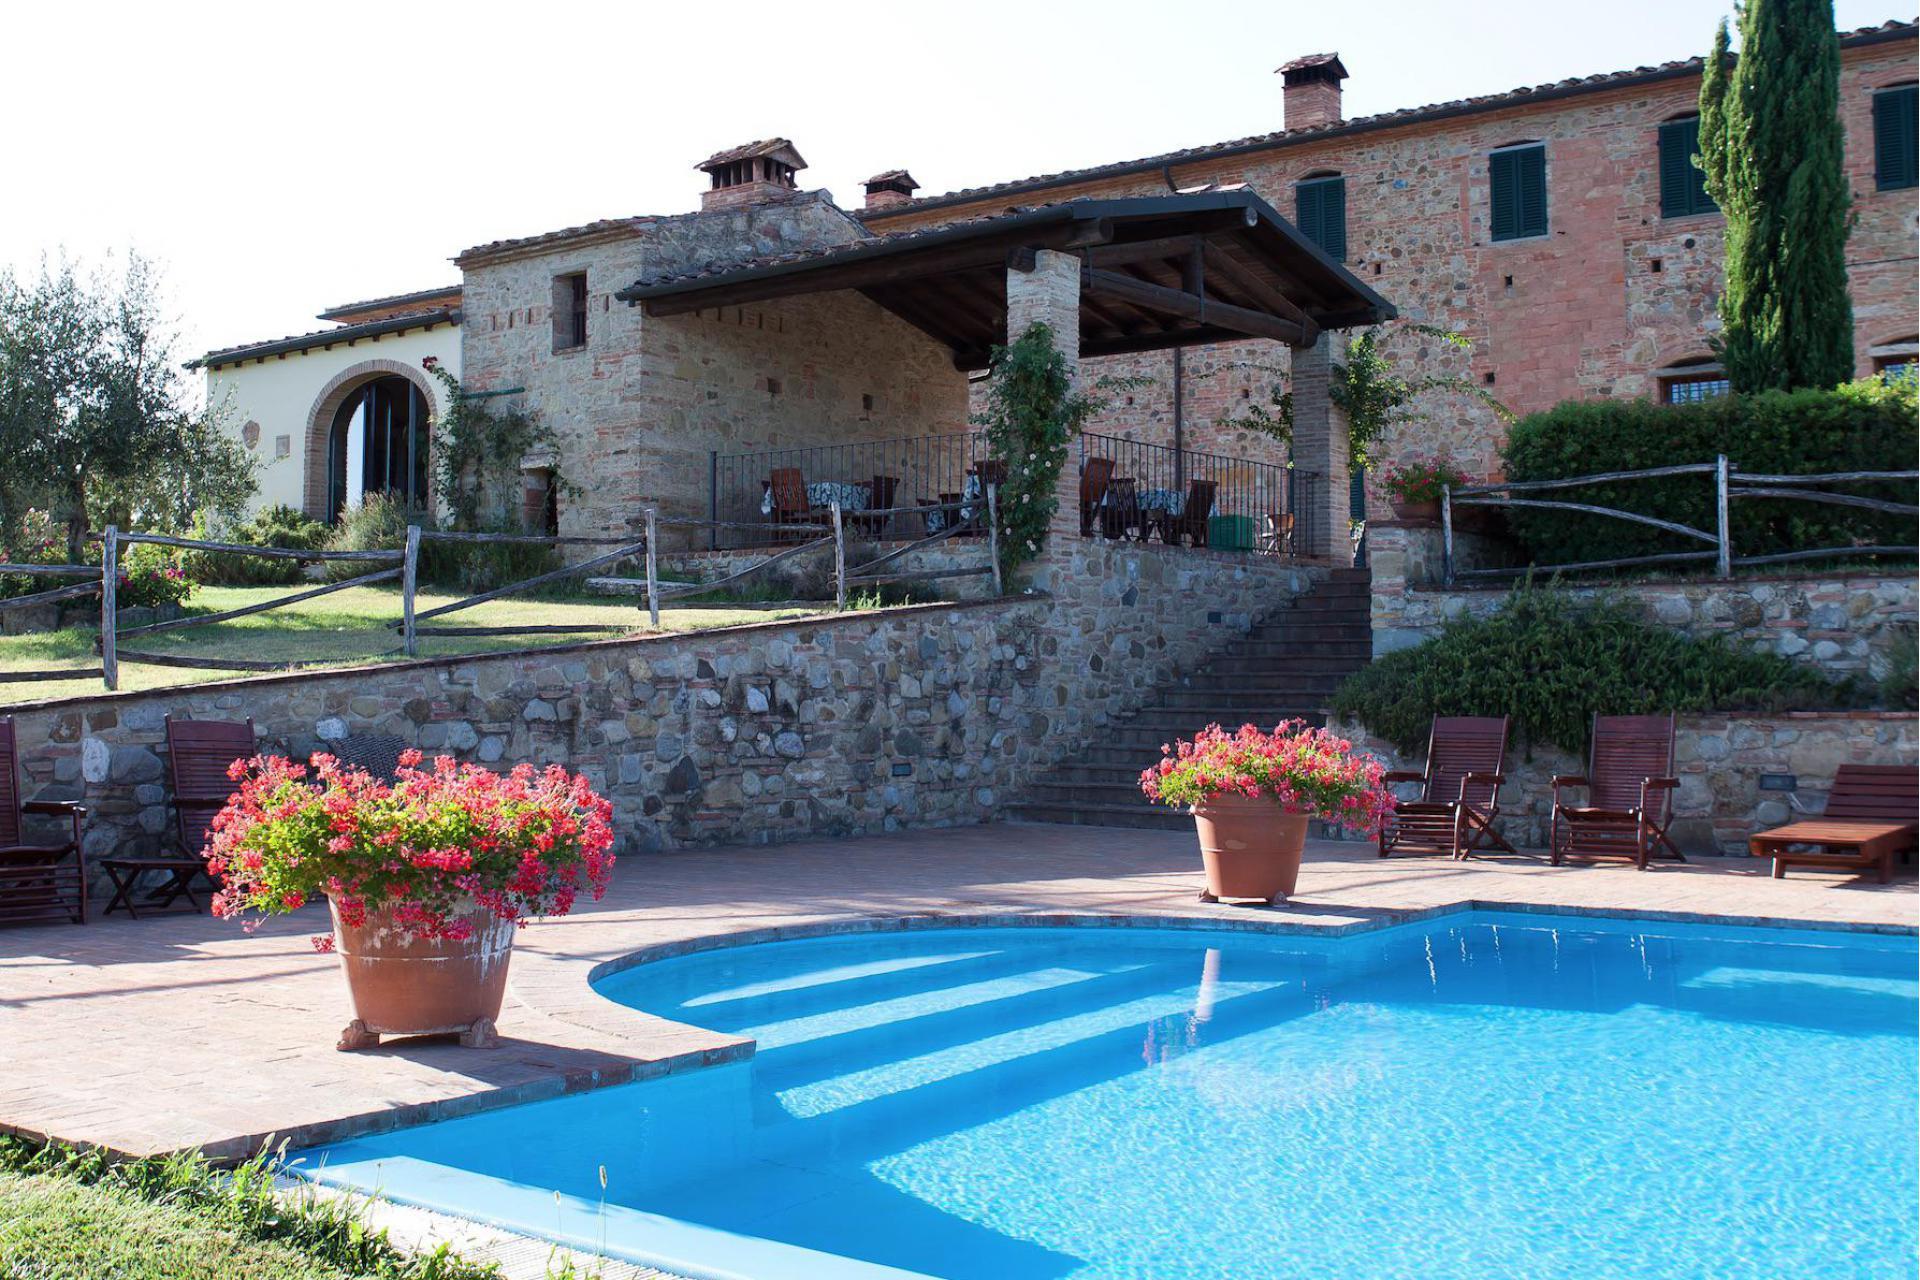 Agriturismo Toscane Luxe agriturismo in Toscane met prachtig uitzicht